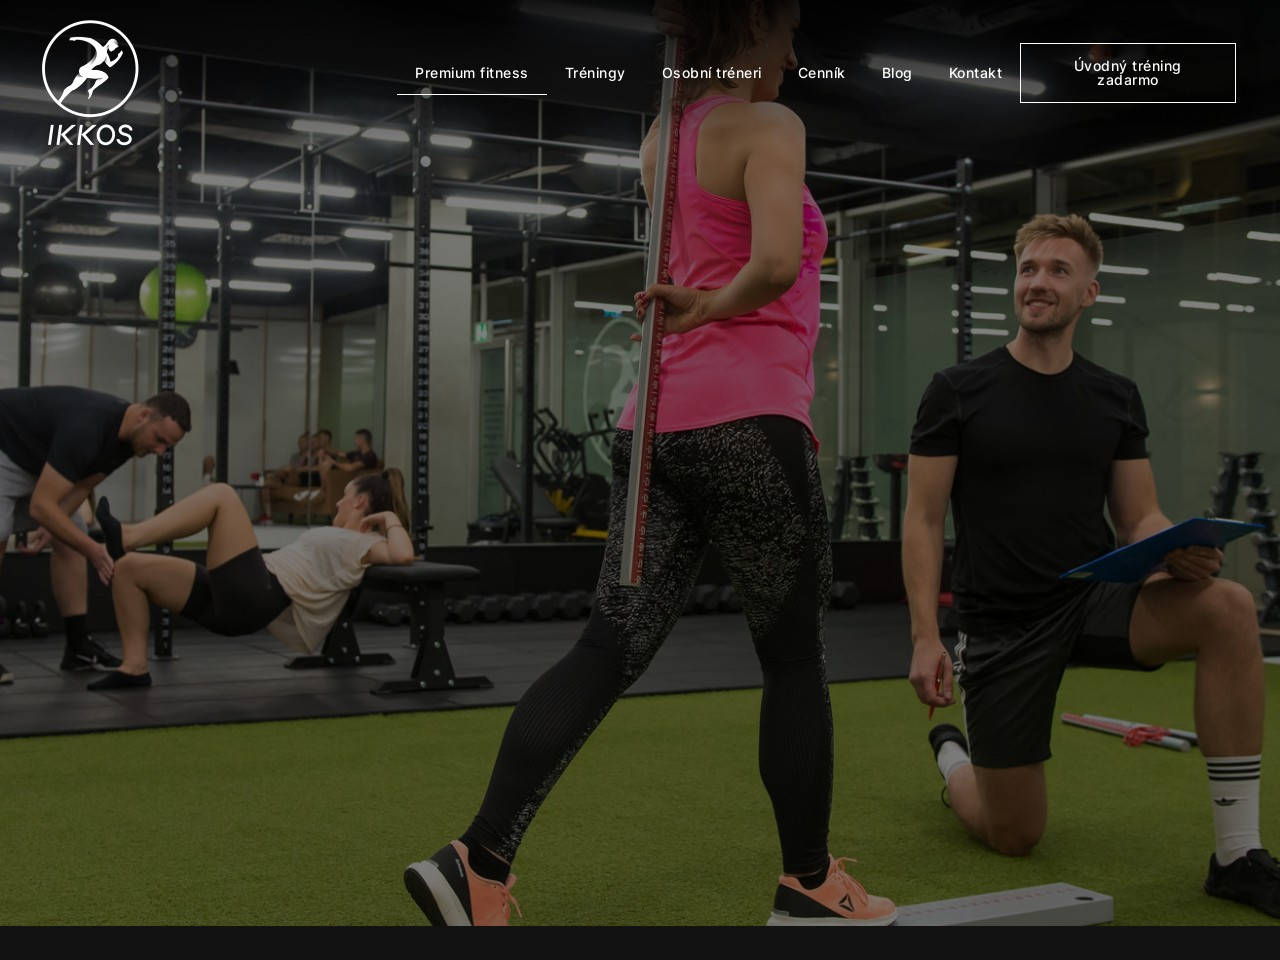 ikkos-tecnology